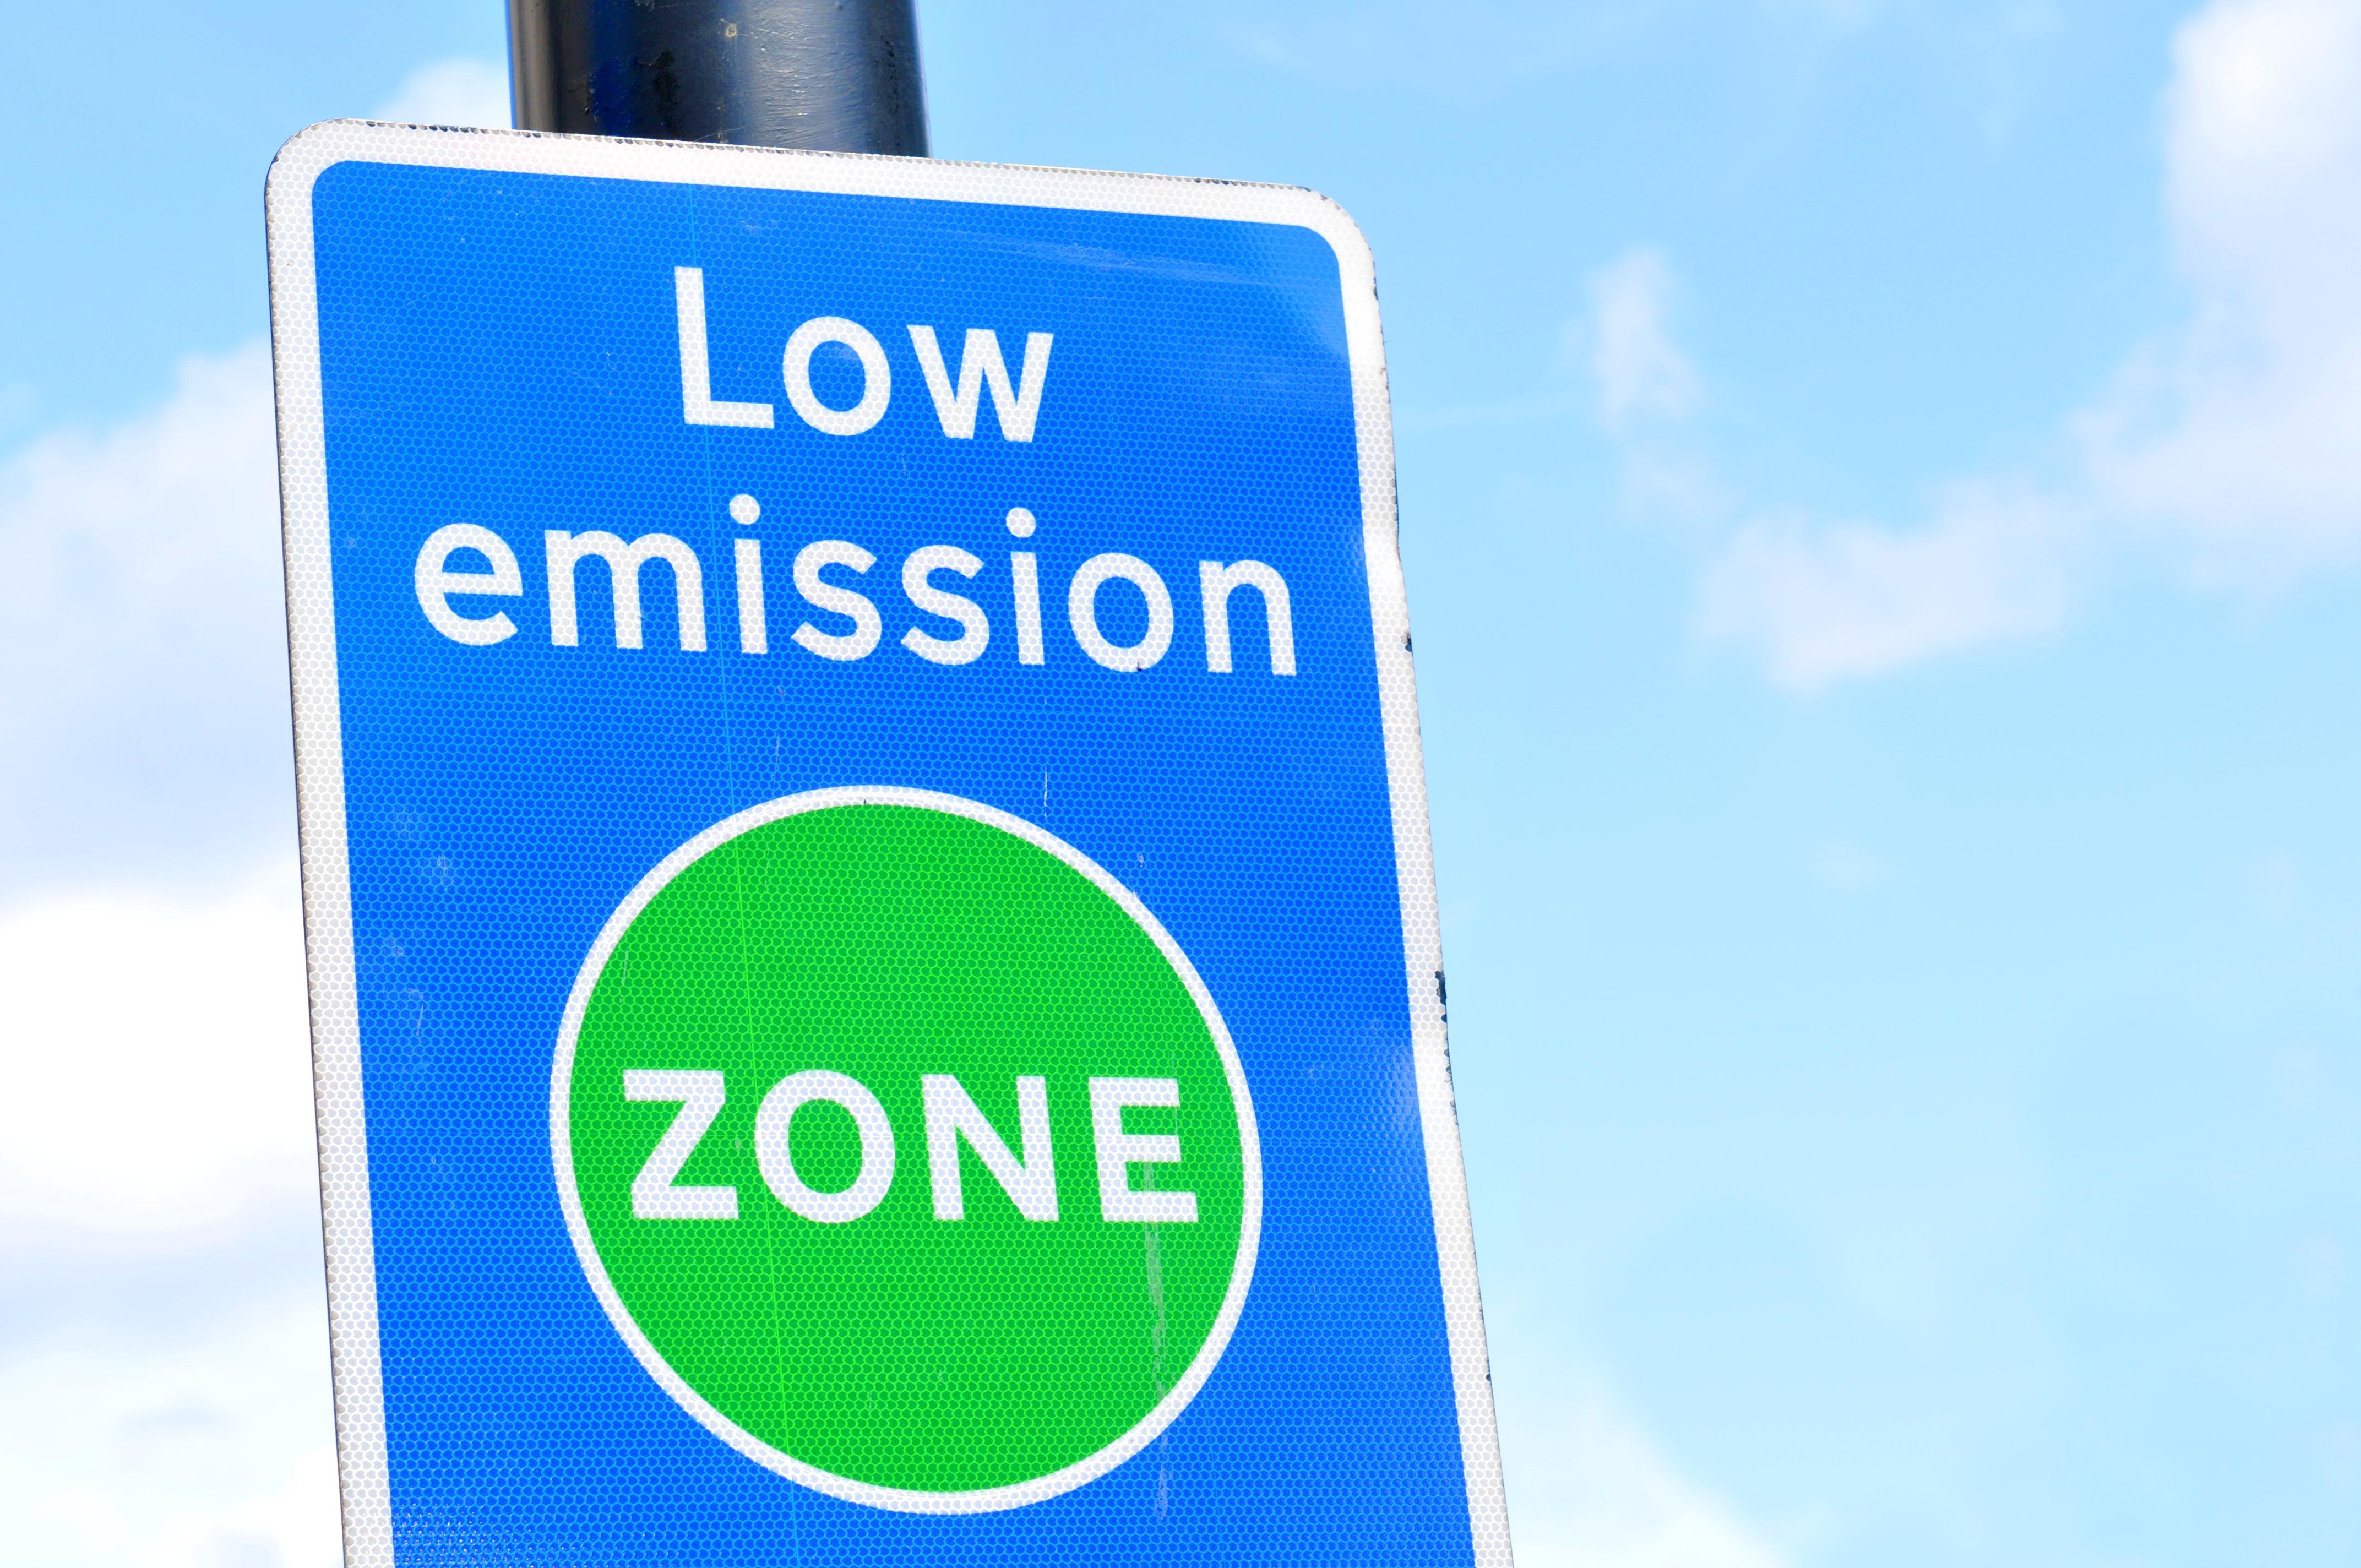 LA Cleantech Incubator Funds Electric Vehicle Rental Program